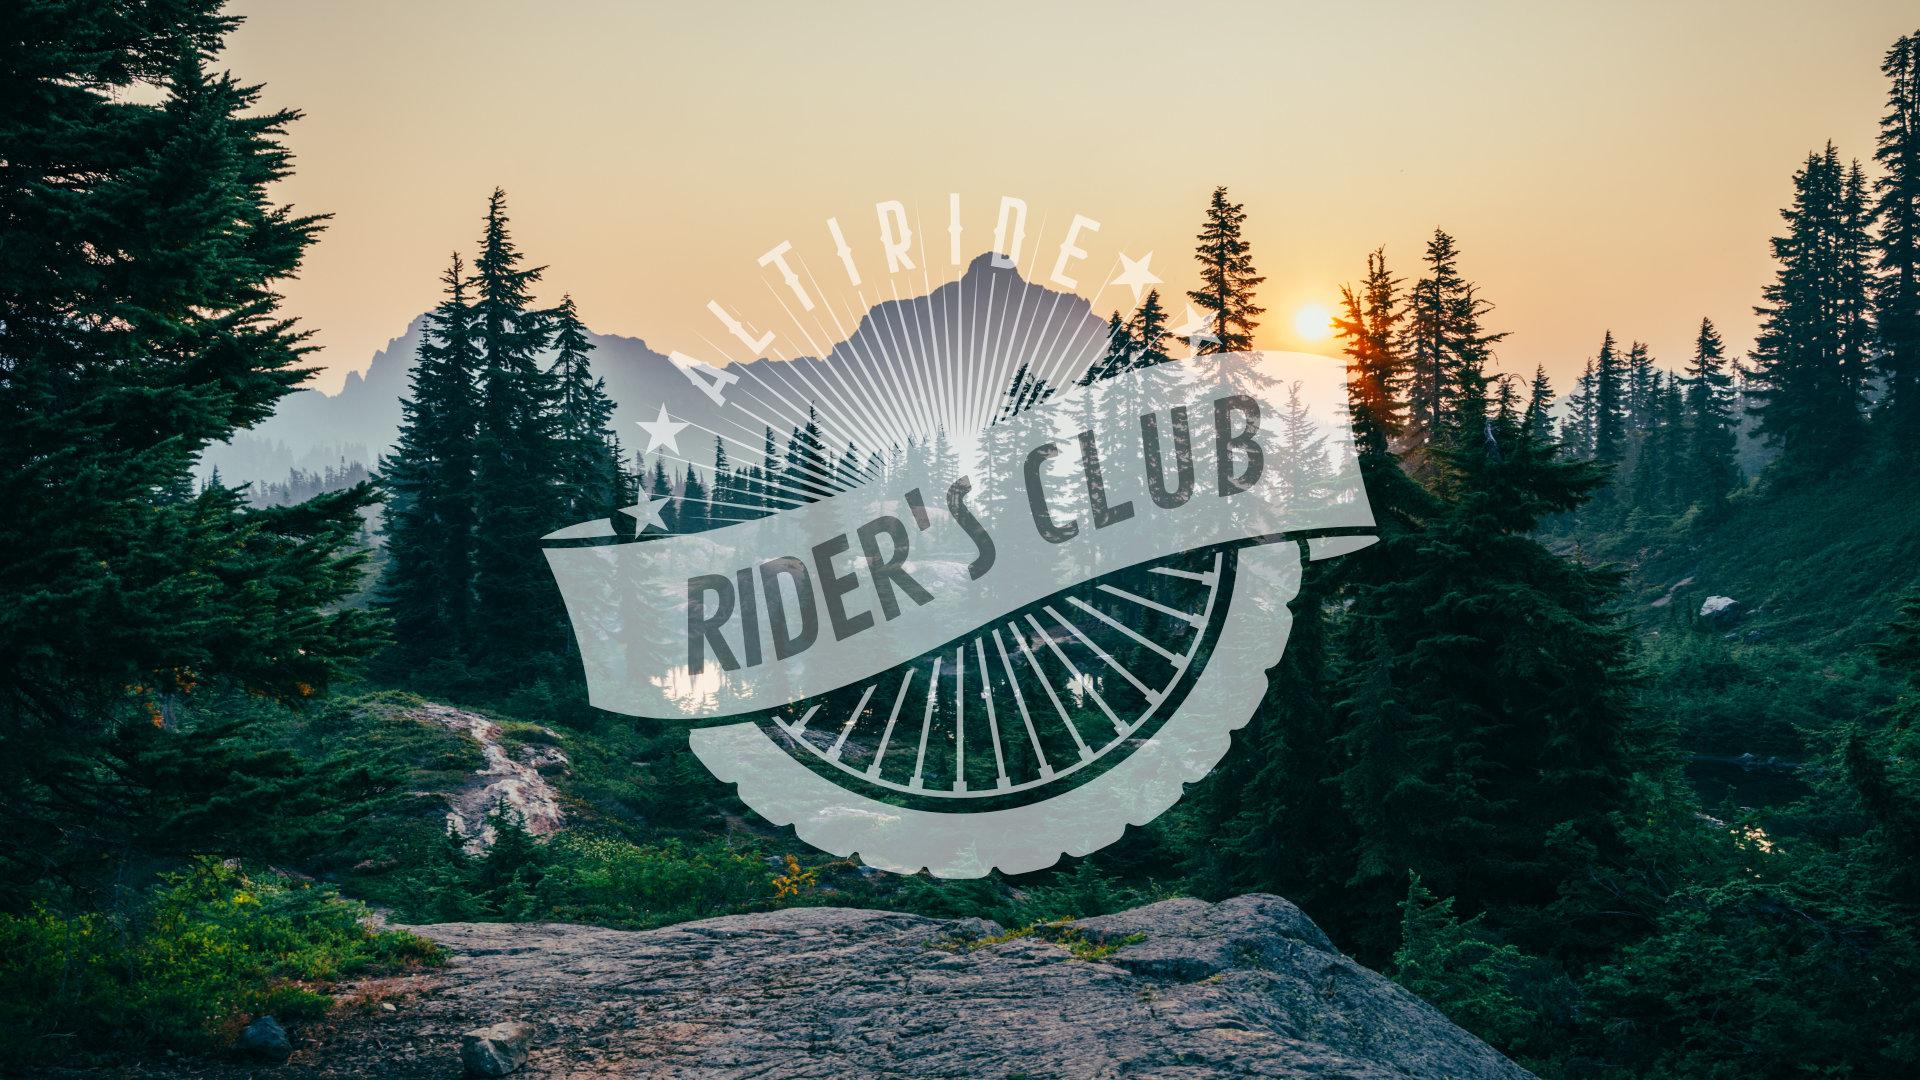 Altiride Rider's Club